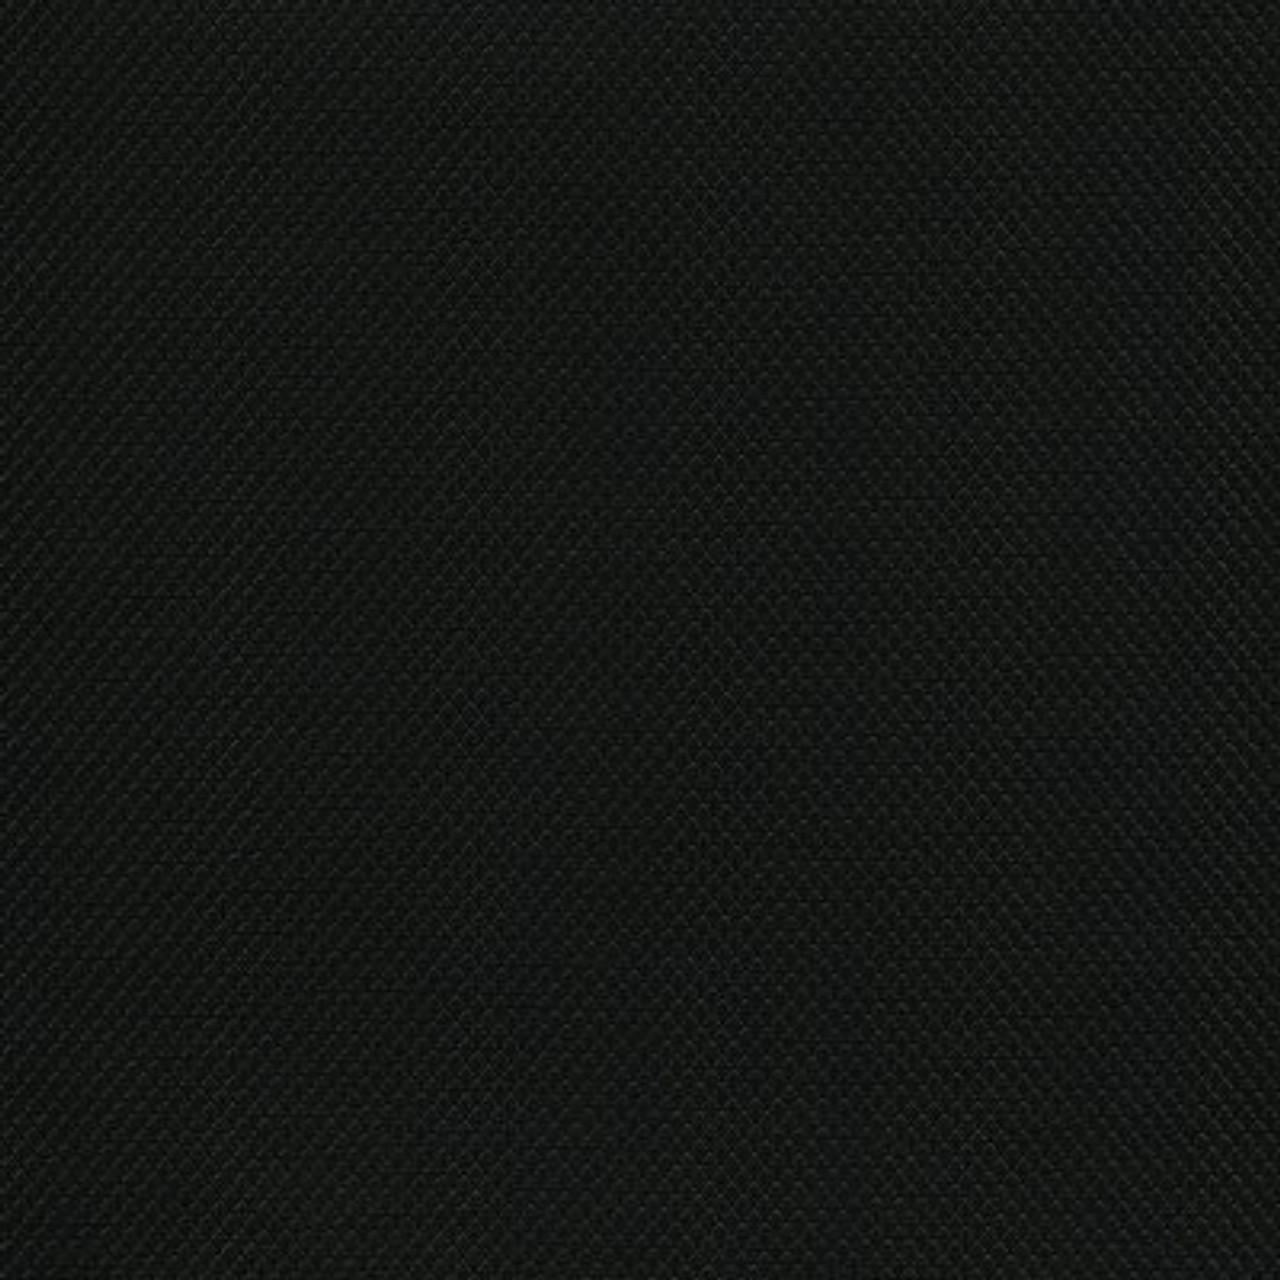 "Enduratex Vinyl Headliner CLASSIC TIER 770 Black 54"" - Sold by the Yard"